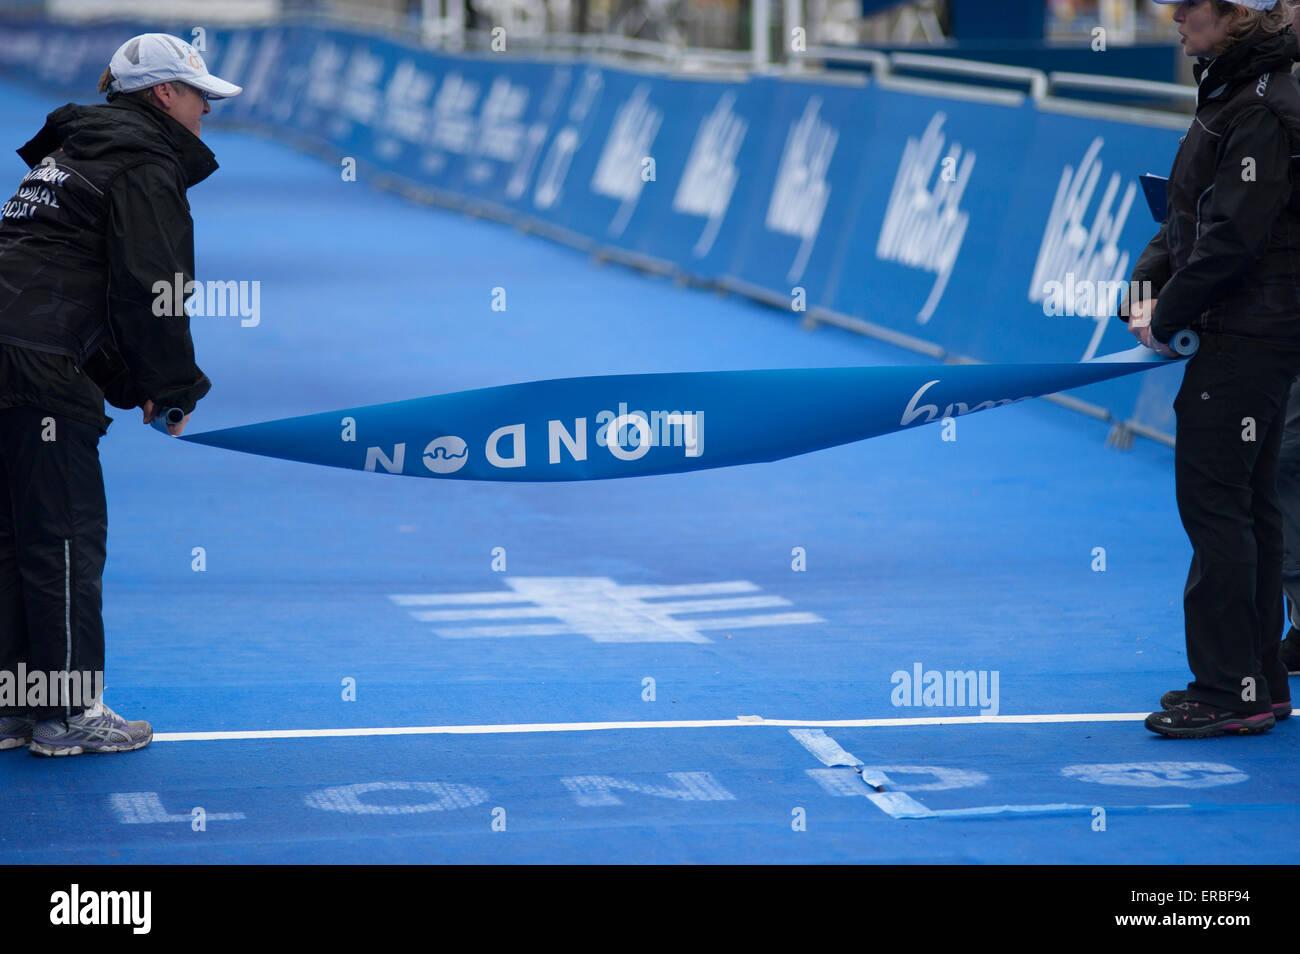 Hyde Park, London, UK. 31st May, 2015. Part of the ITU World Triathlon Series, the Elite Men's race includes a 750m - Stock Image